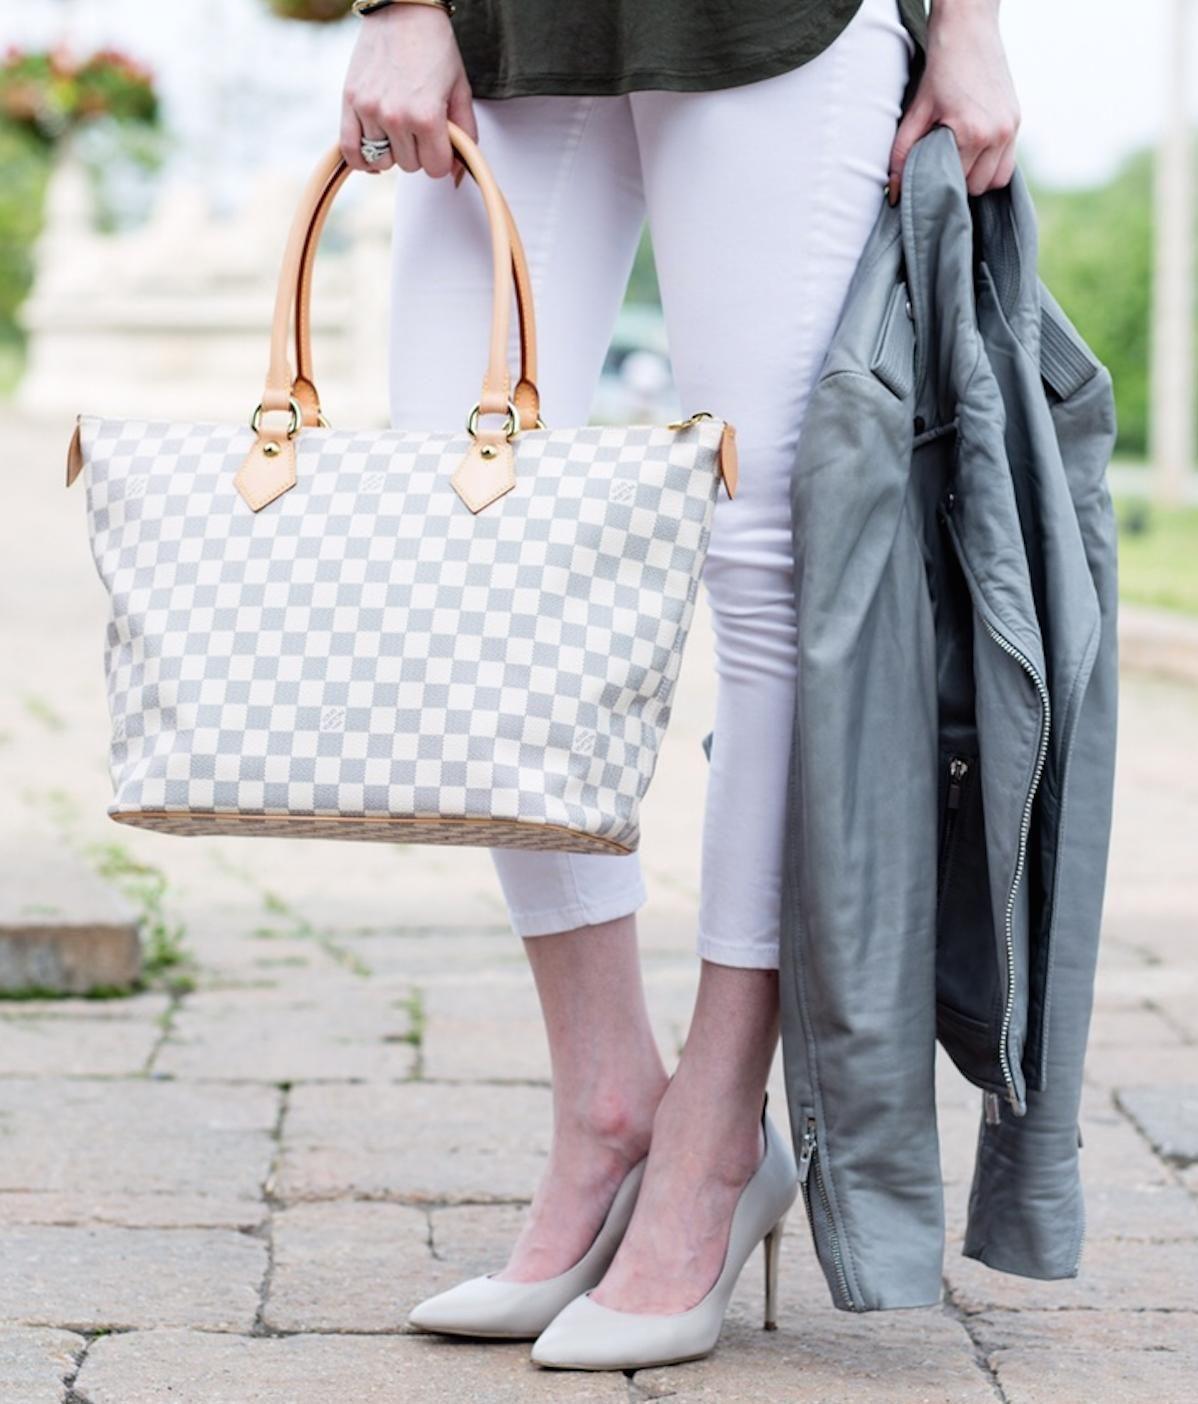 1ade0b7cb475 Louis Vuitton Damier Azur Saleya MM tote